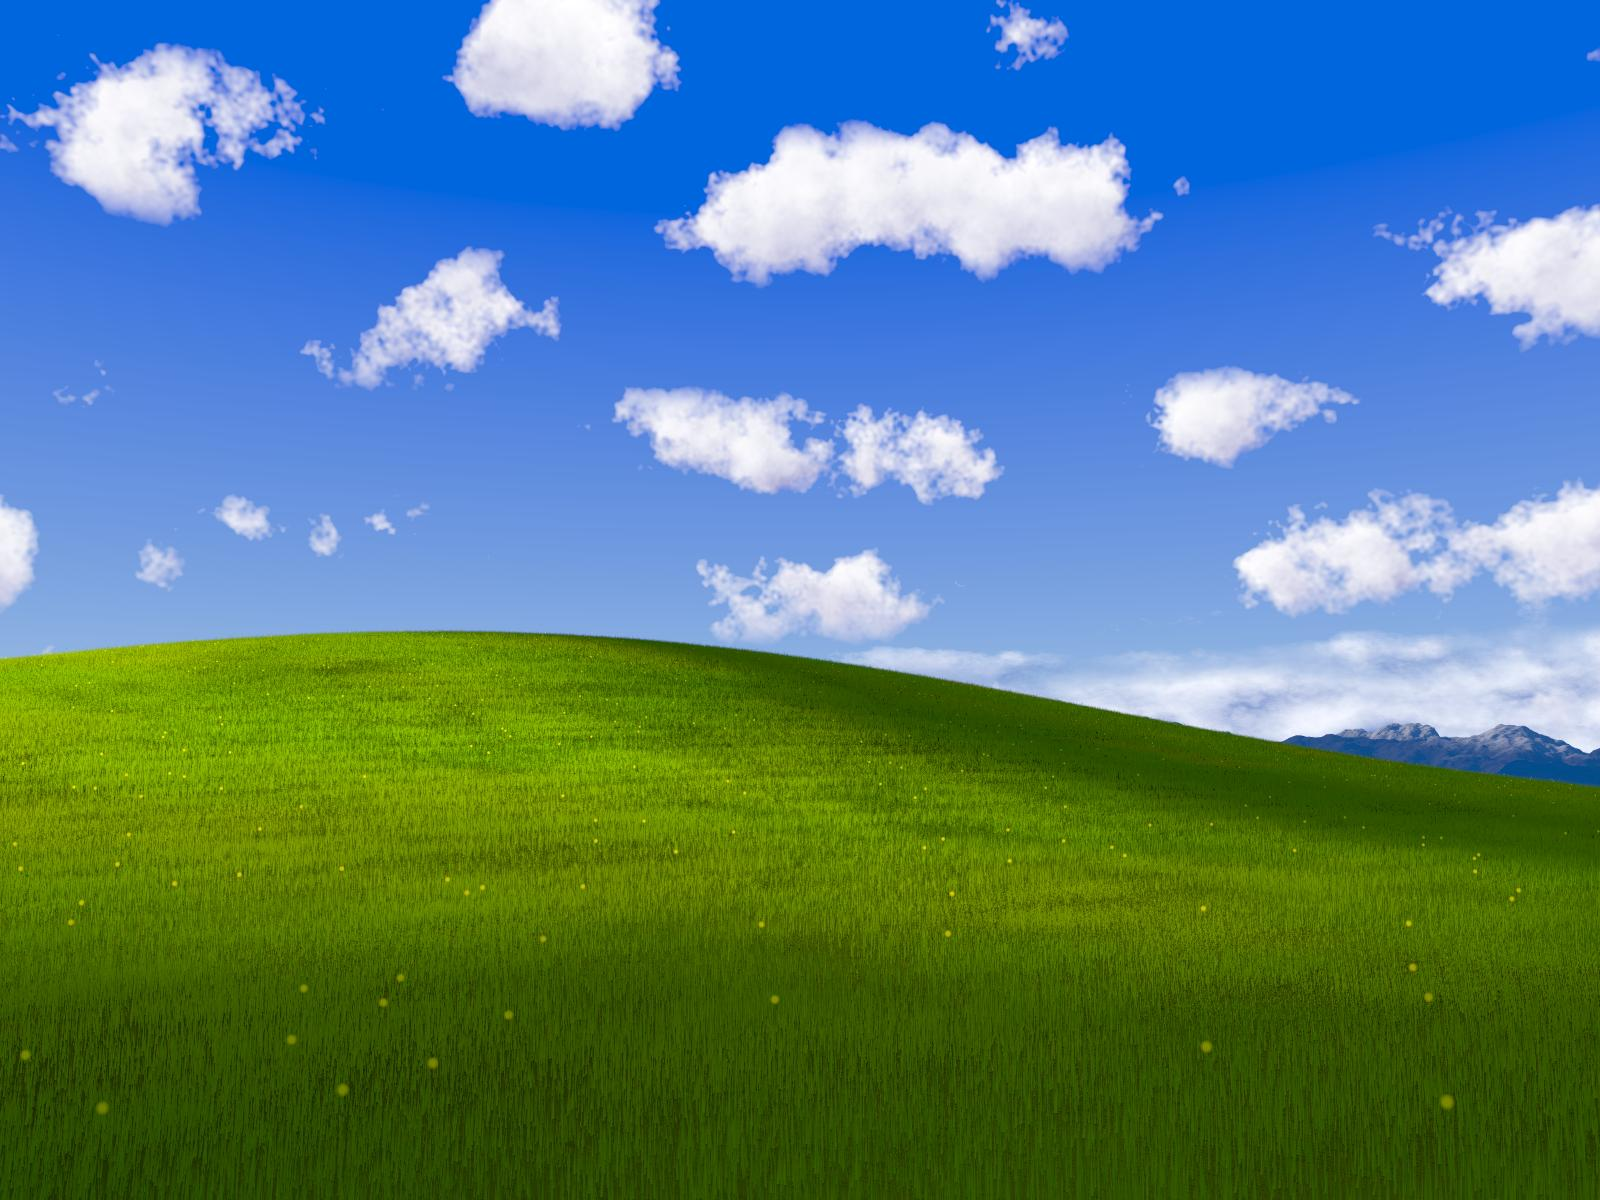 Windows Bliss Wallpaper